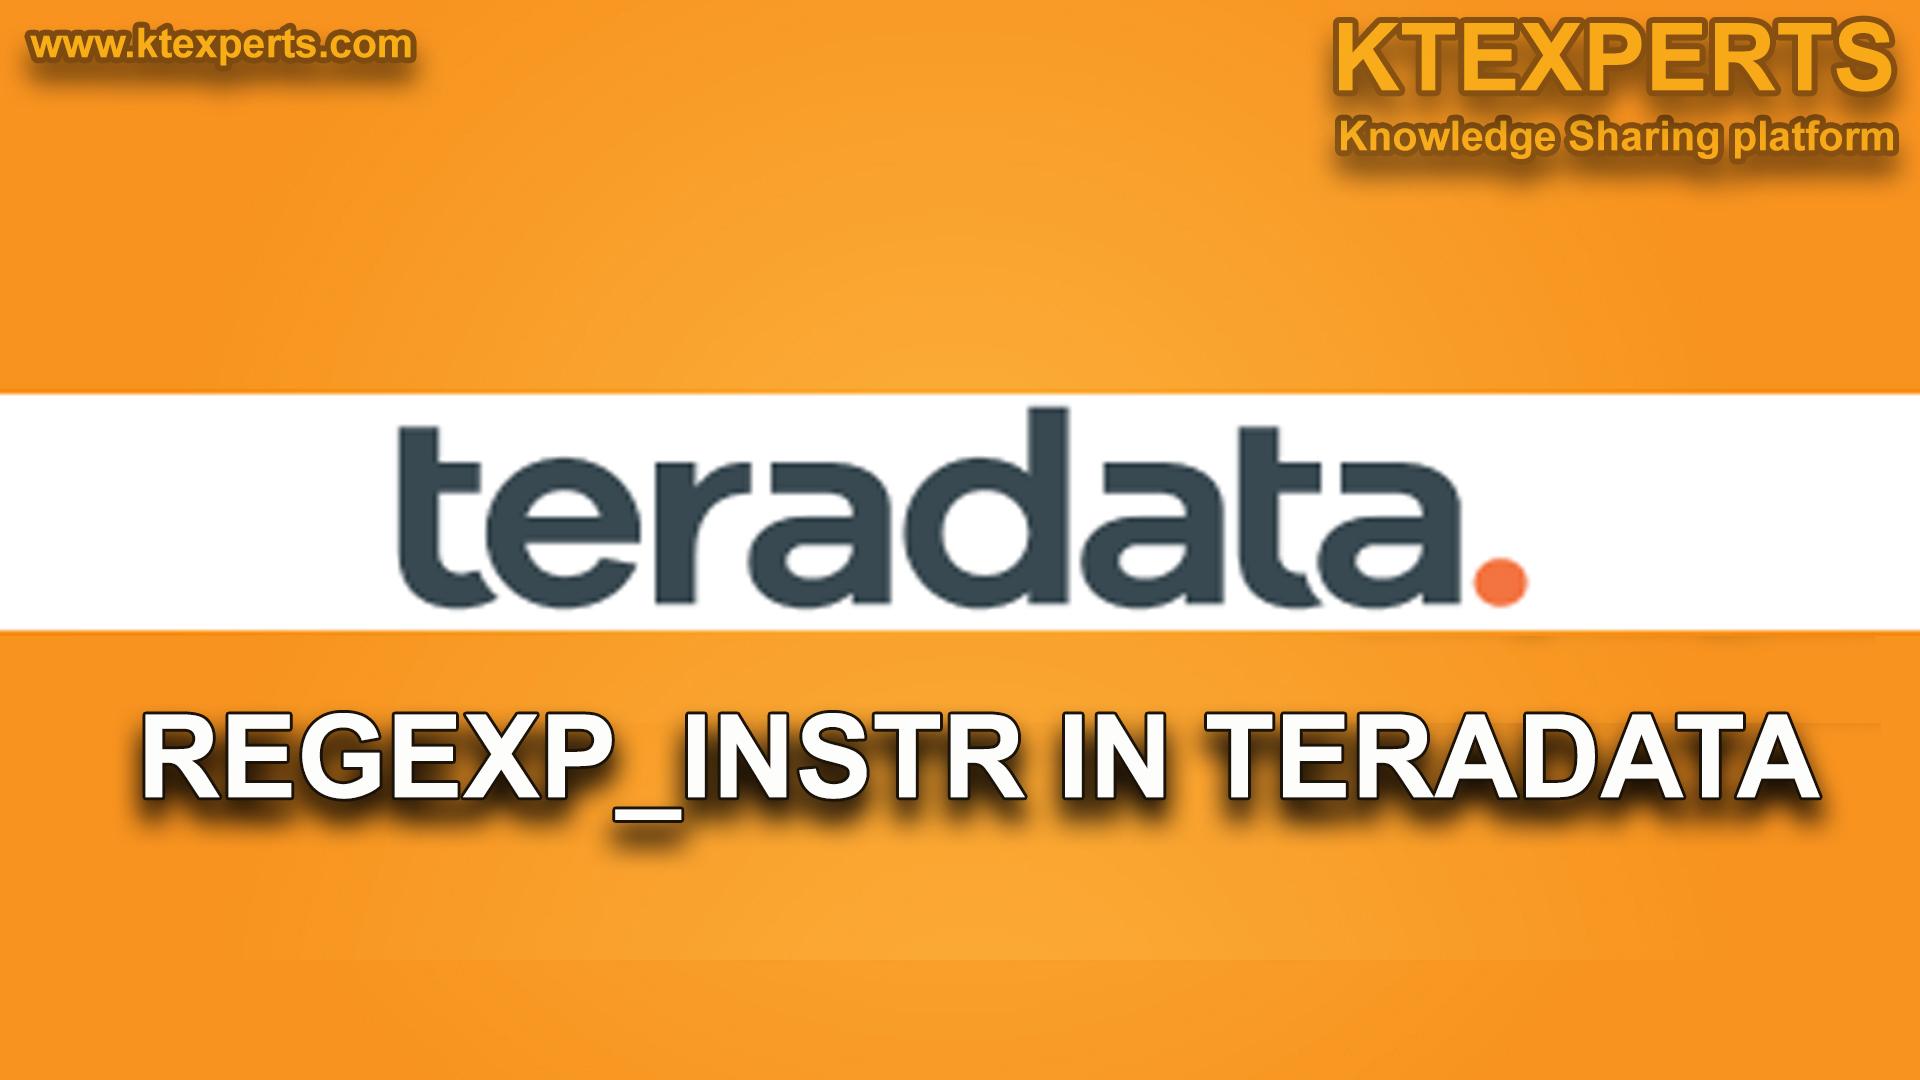 REGEXP_INSTR IN TERADATA